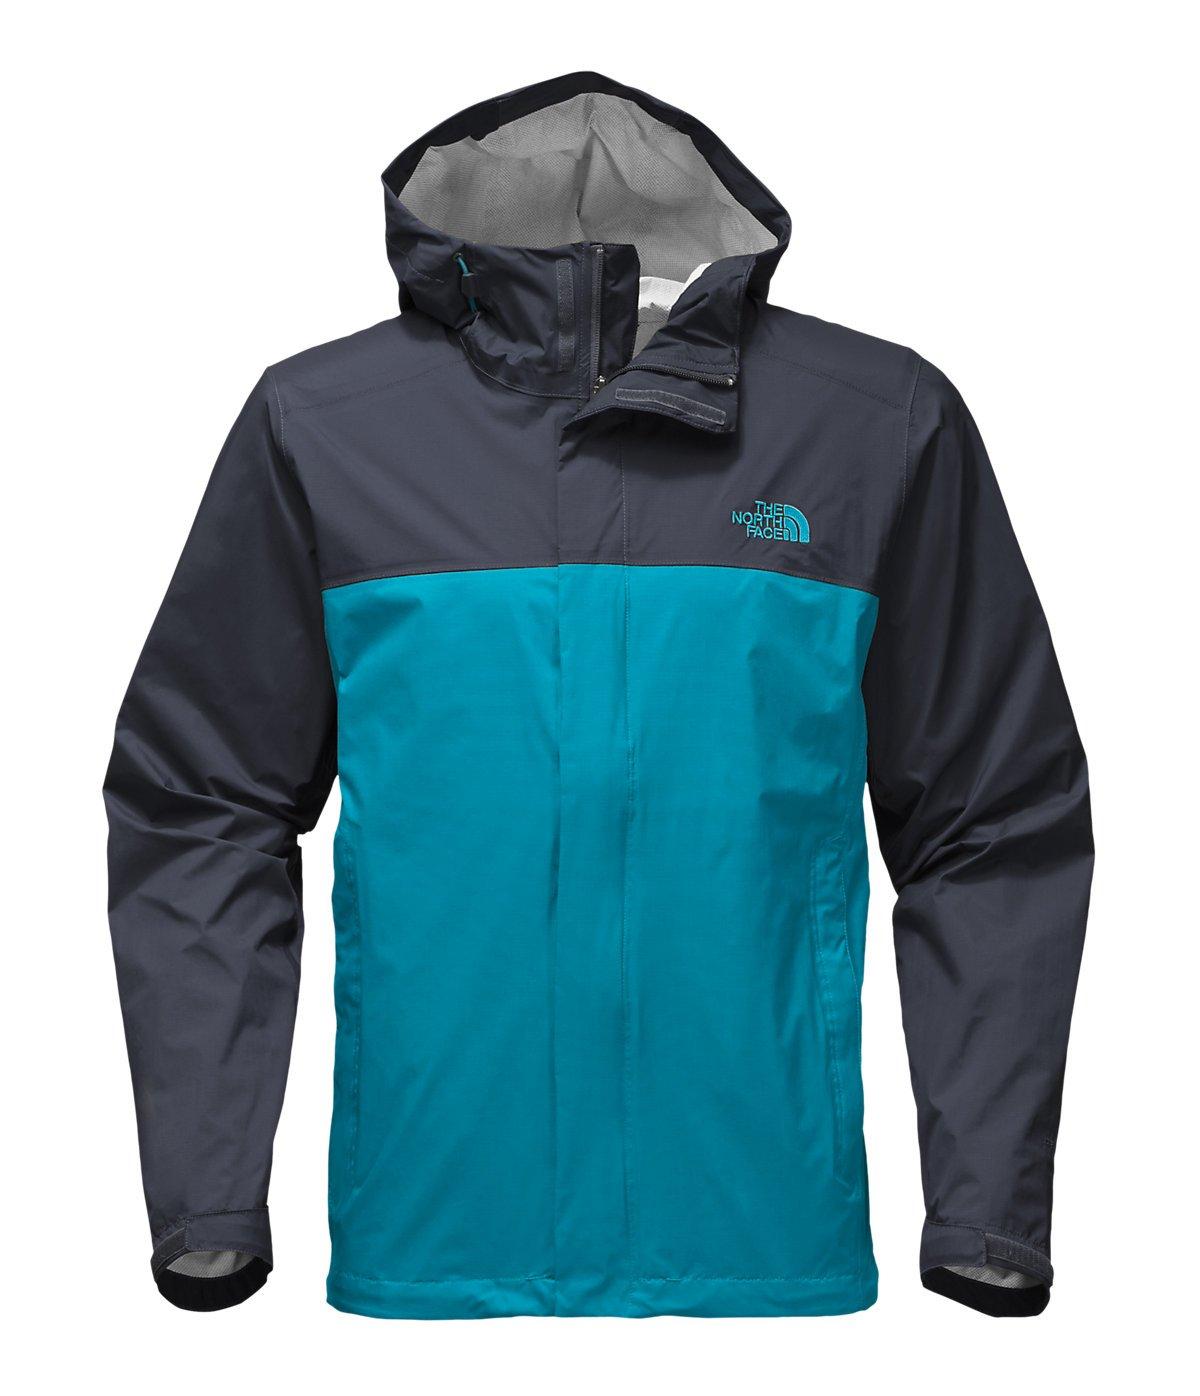 The North Face Men's Venture 2 Jacket - Brilliant Blue/Urban Navy - XL (Past Season)